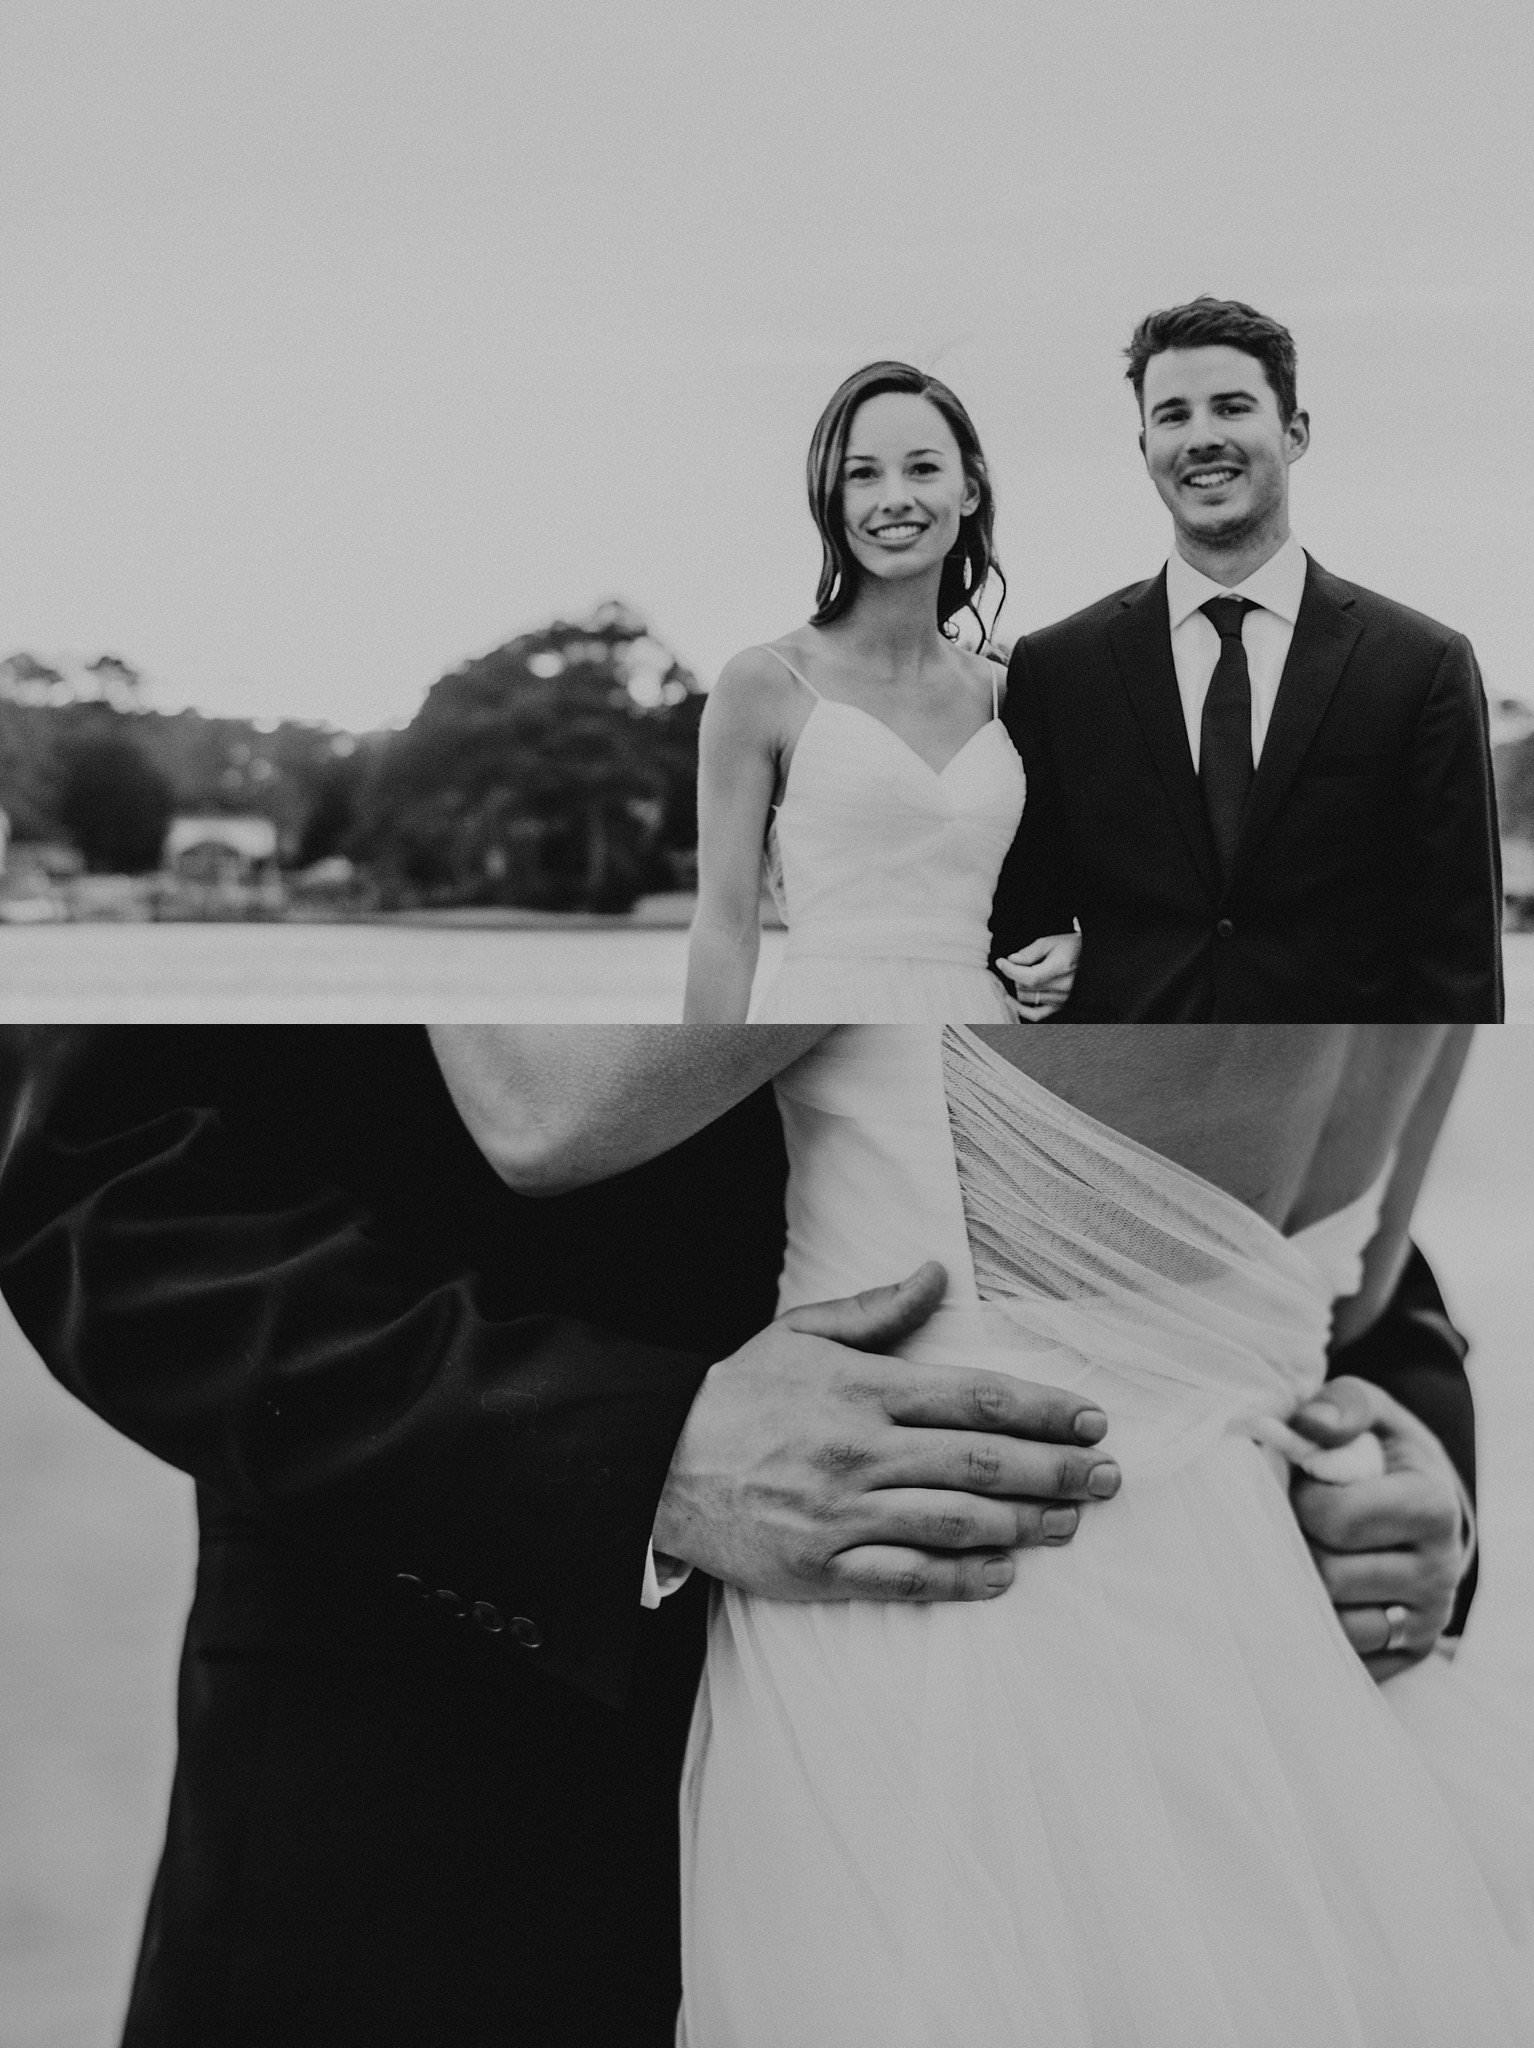 romantic-intimate-wedding-photos-of-bride-groom-in-va-beach-by-hampton-roads-wedding-photographer-melissa-bliss-photography.jpg